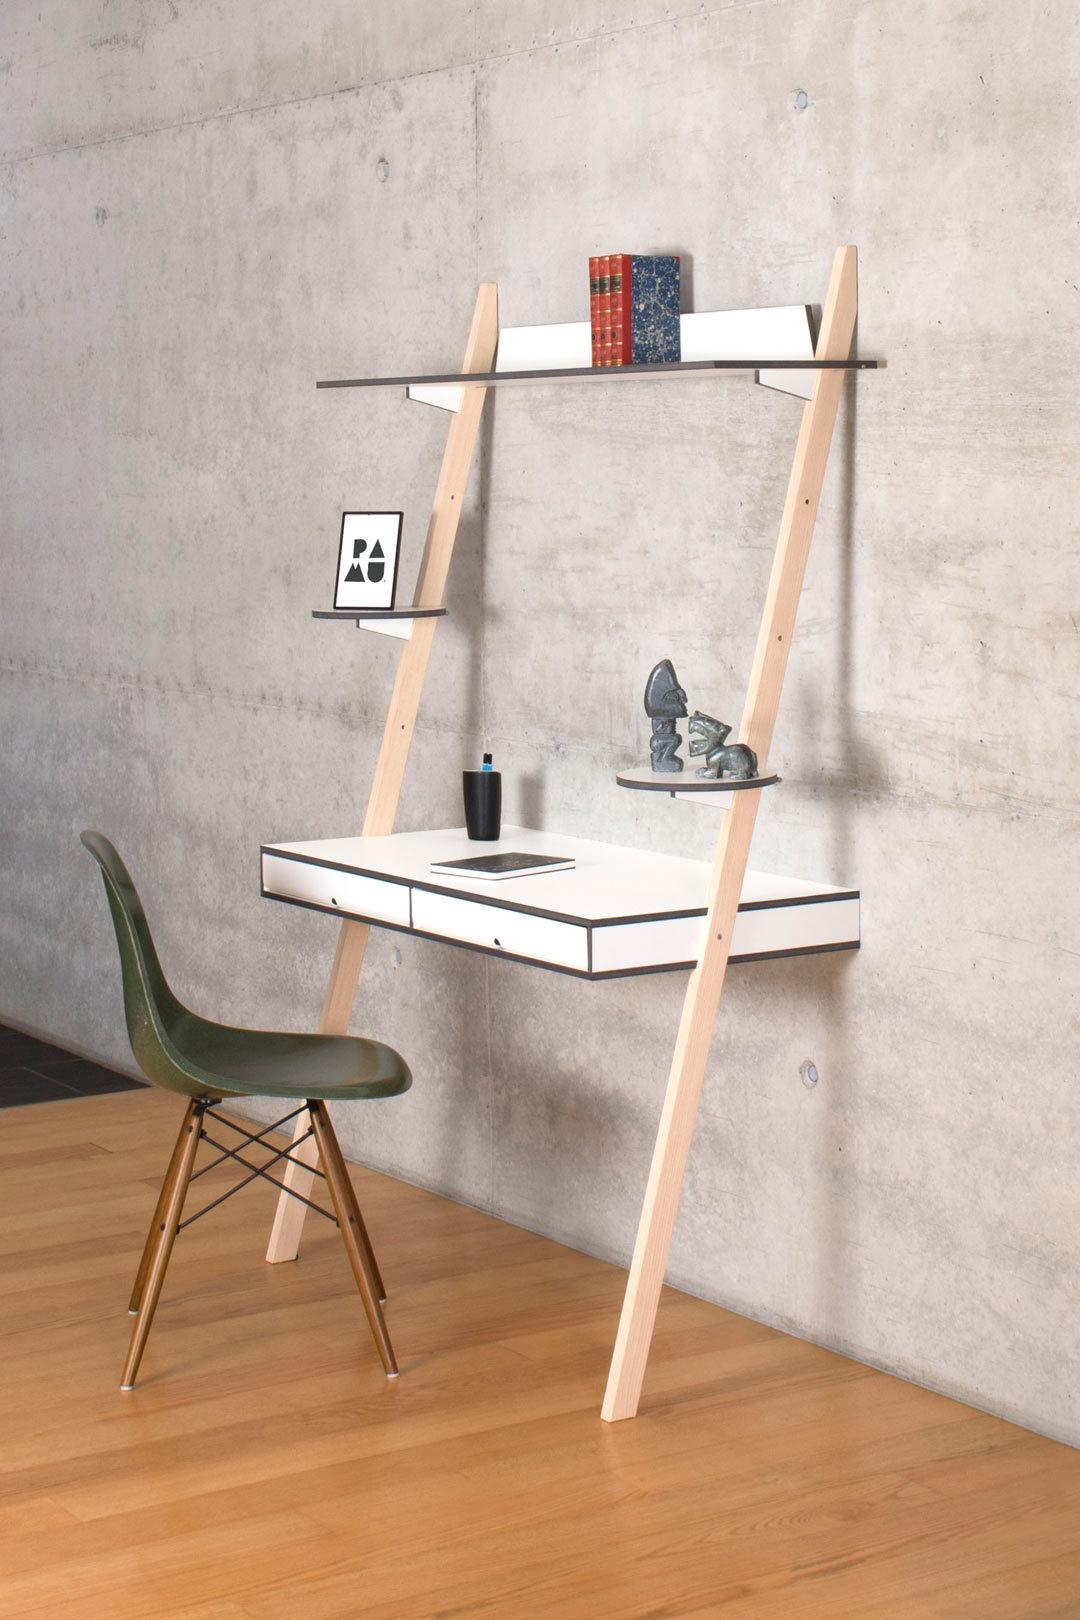 lean-on-desk-pamu-2